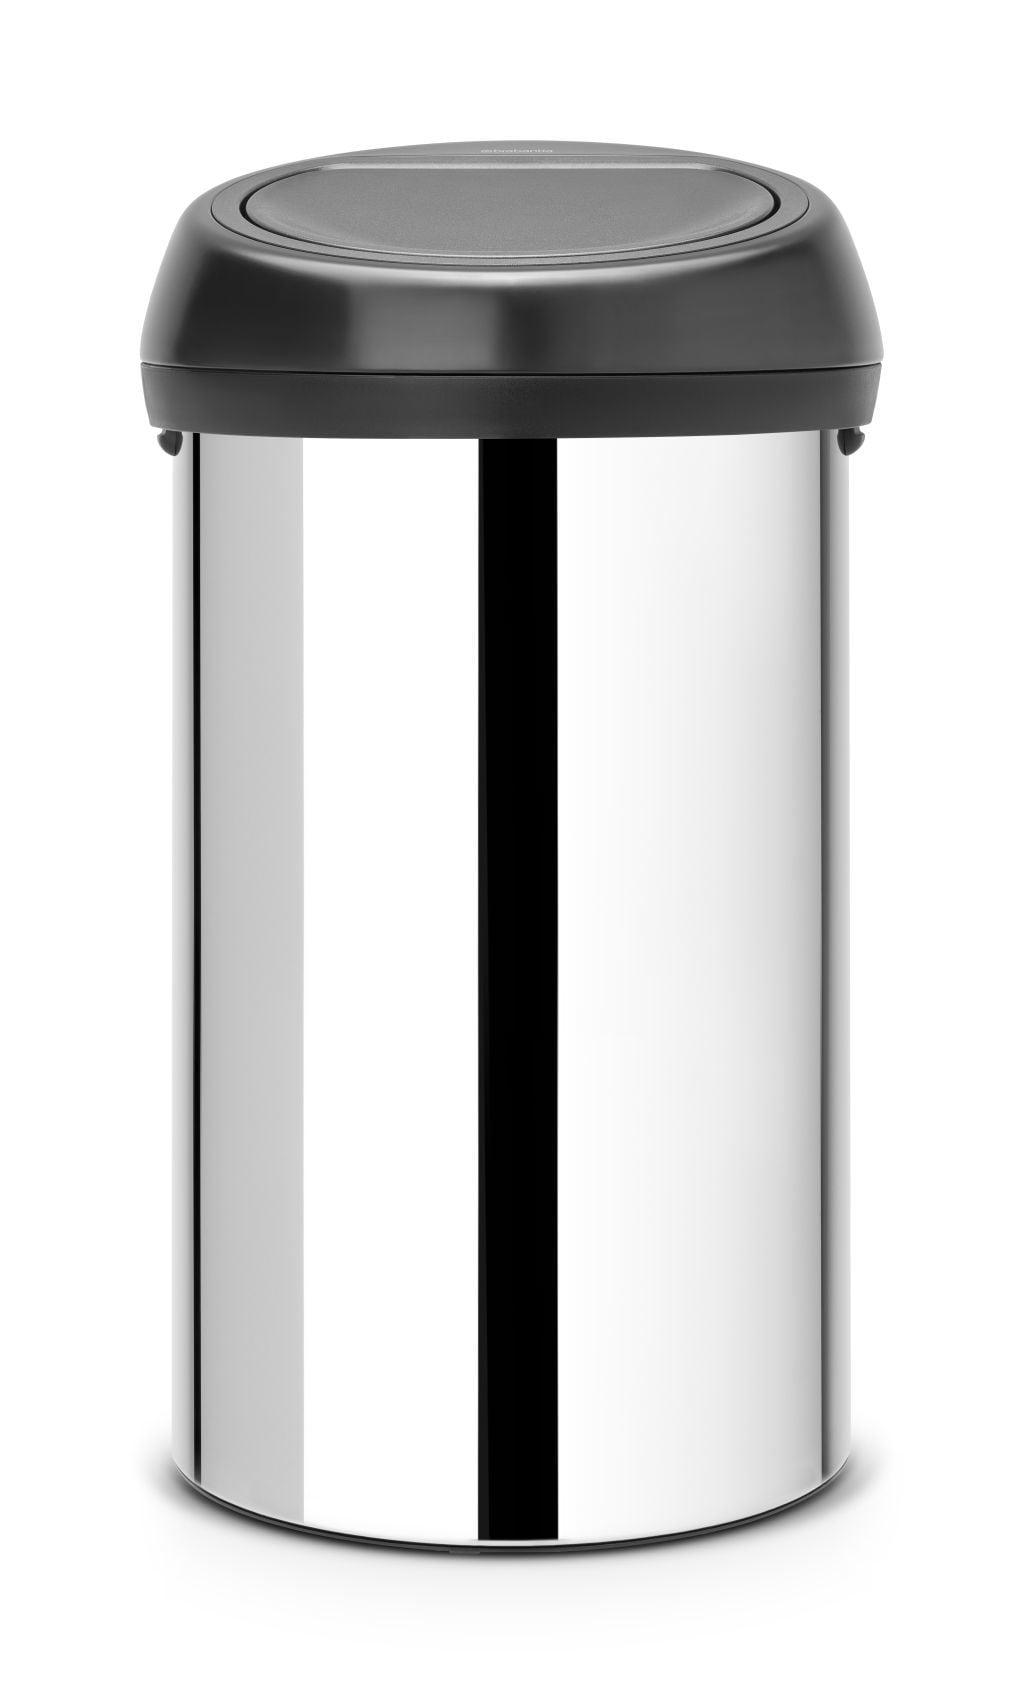 Brabantia Prullenbak 60 Liter.Brabantia Touch Bin 60 Liter Brilliant Steel Brabantia Touch Bin 60 Liter Brilliant Steel